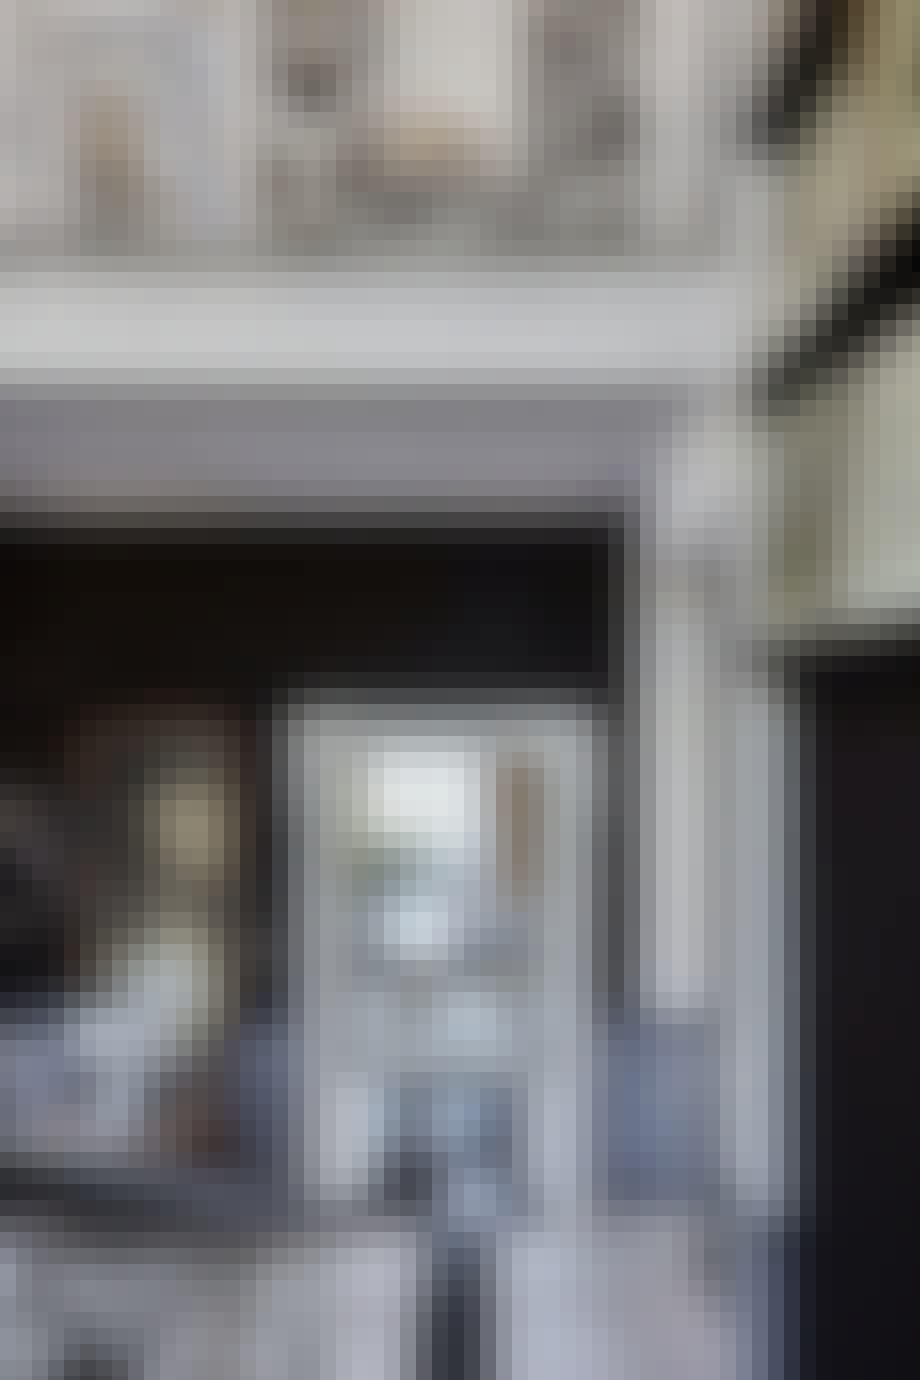 Hall med mørke farvetoner og marmorgulv